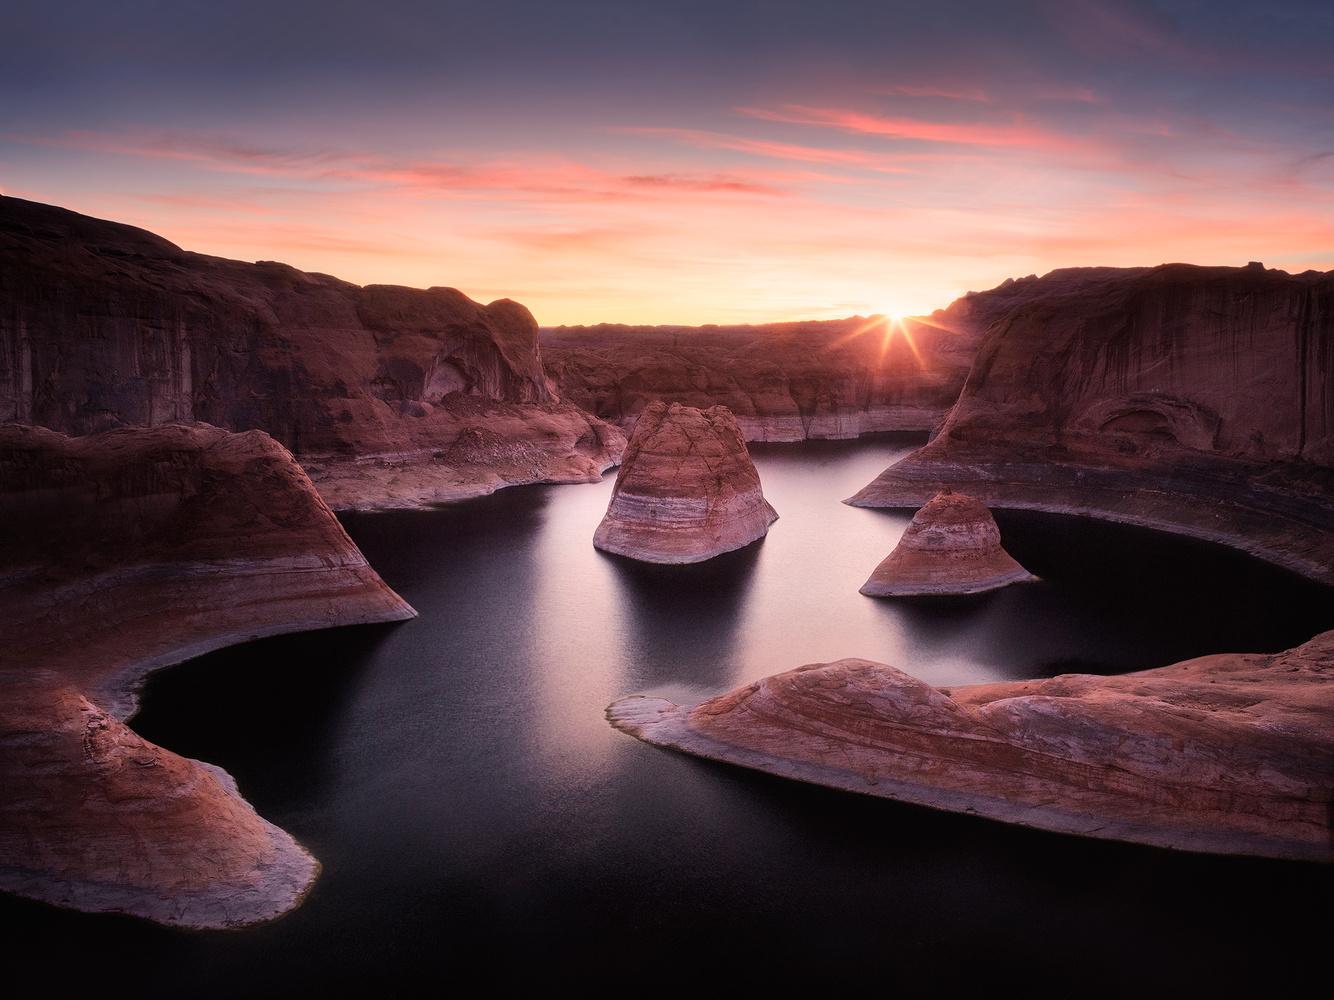 Reflection Canyon by Oleksandr Mokrohuz